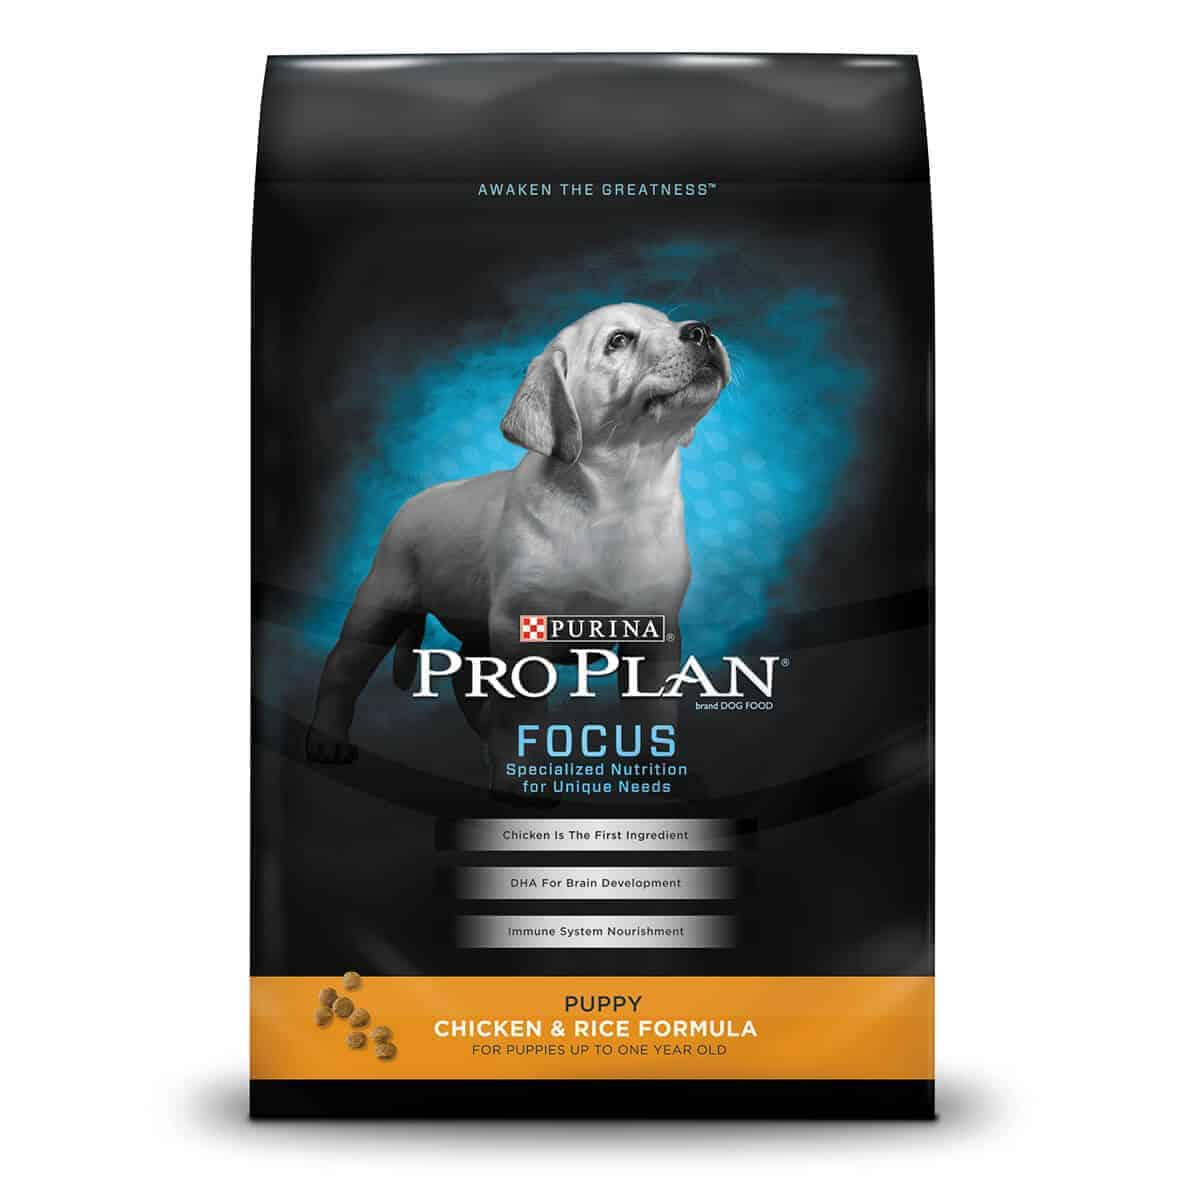 Purina Pro Plan Focus Puppy Chicken & Rice, 18 lb